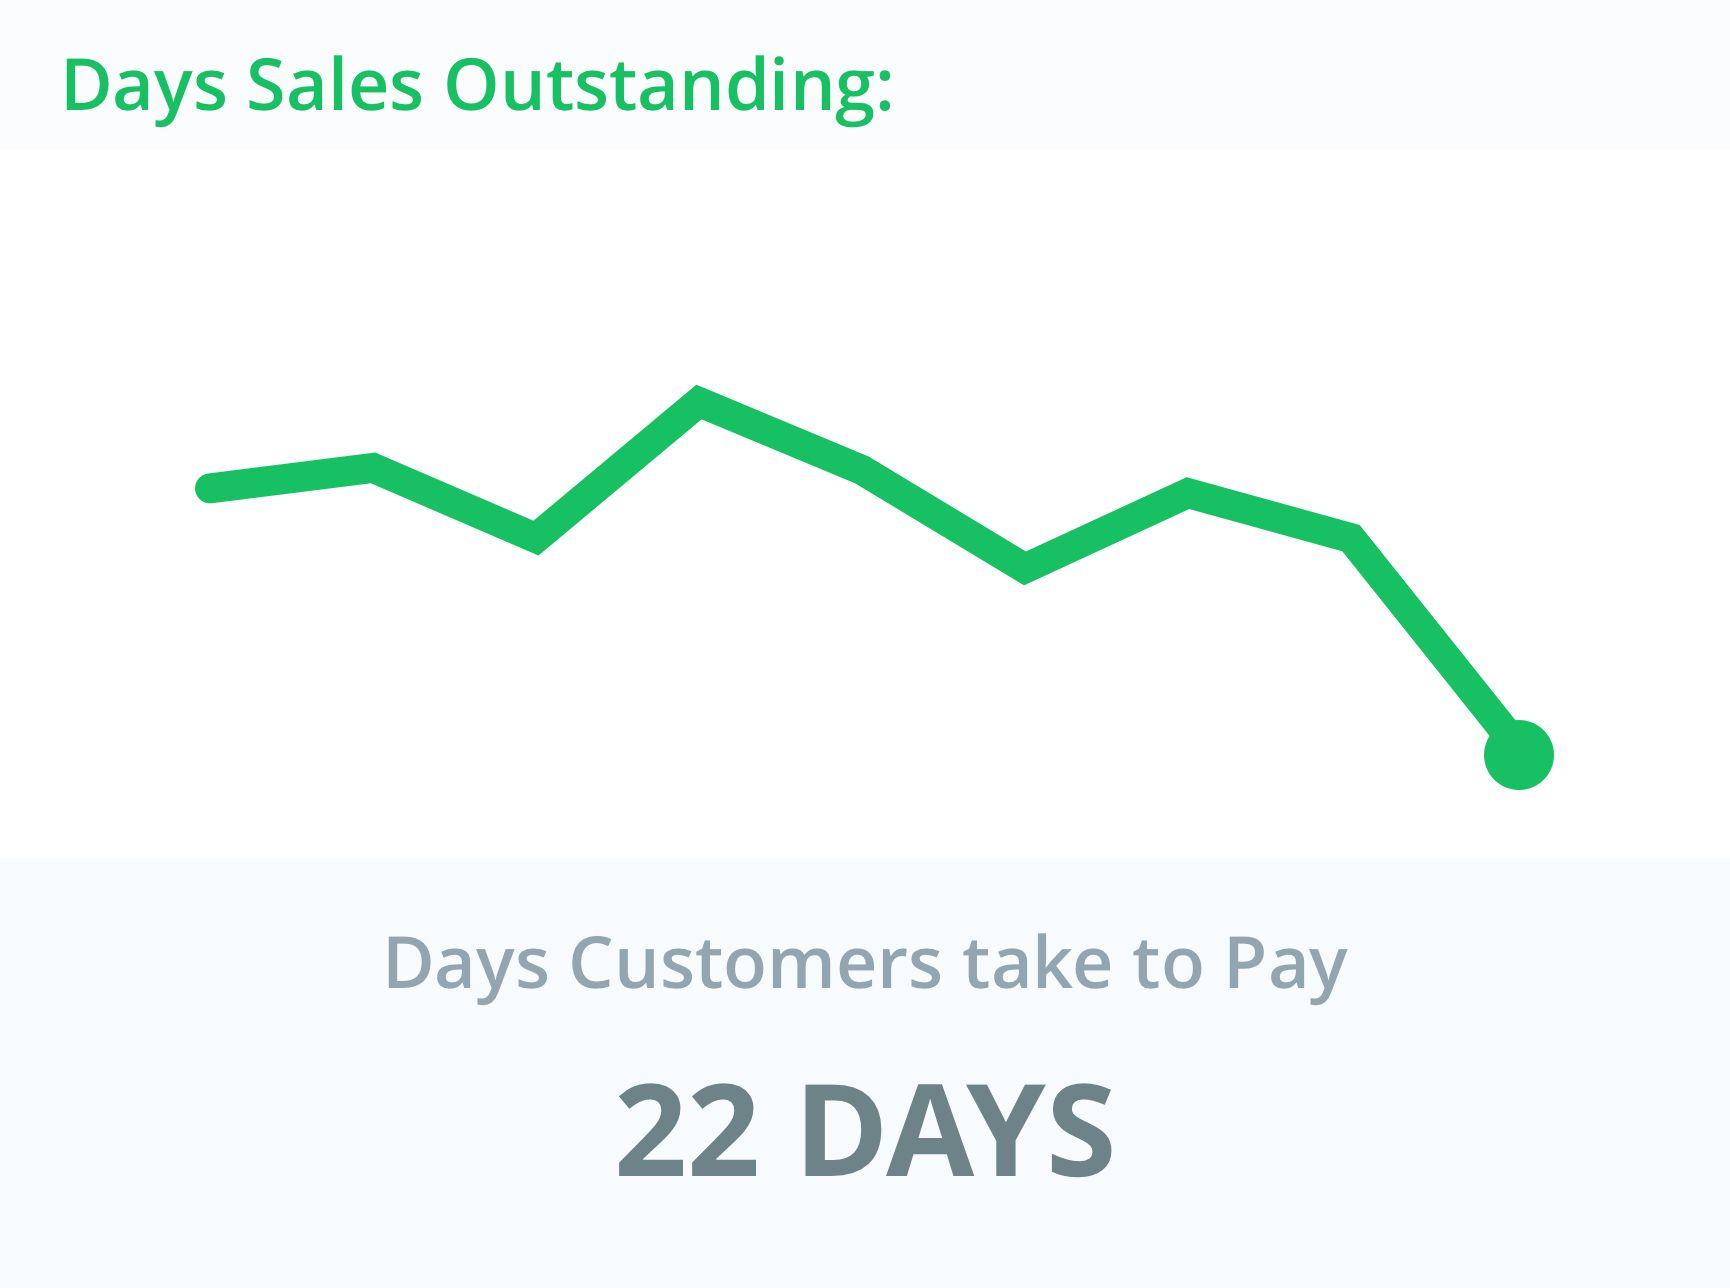 Days Sales Outstanding - Balance Sheet Metrics